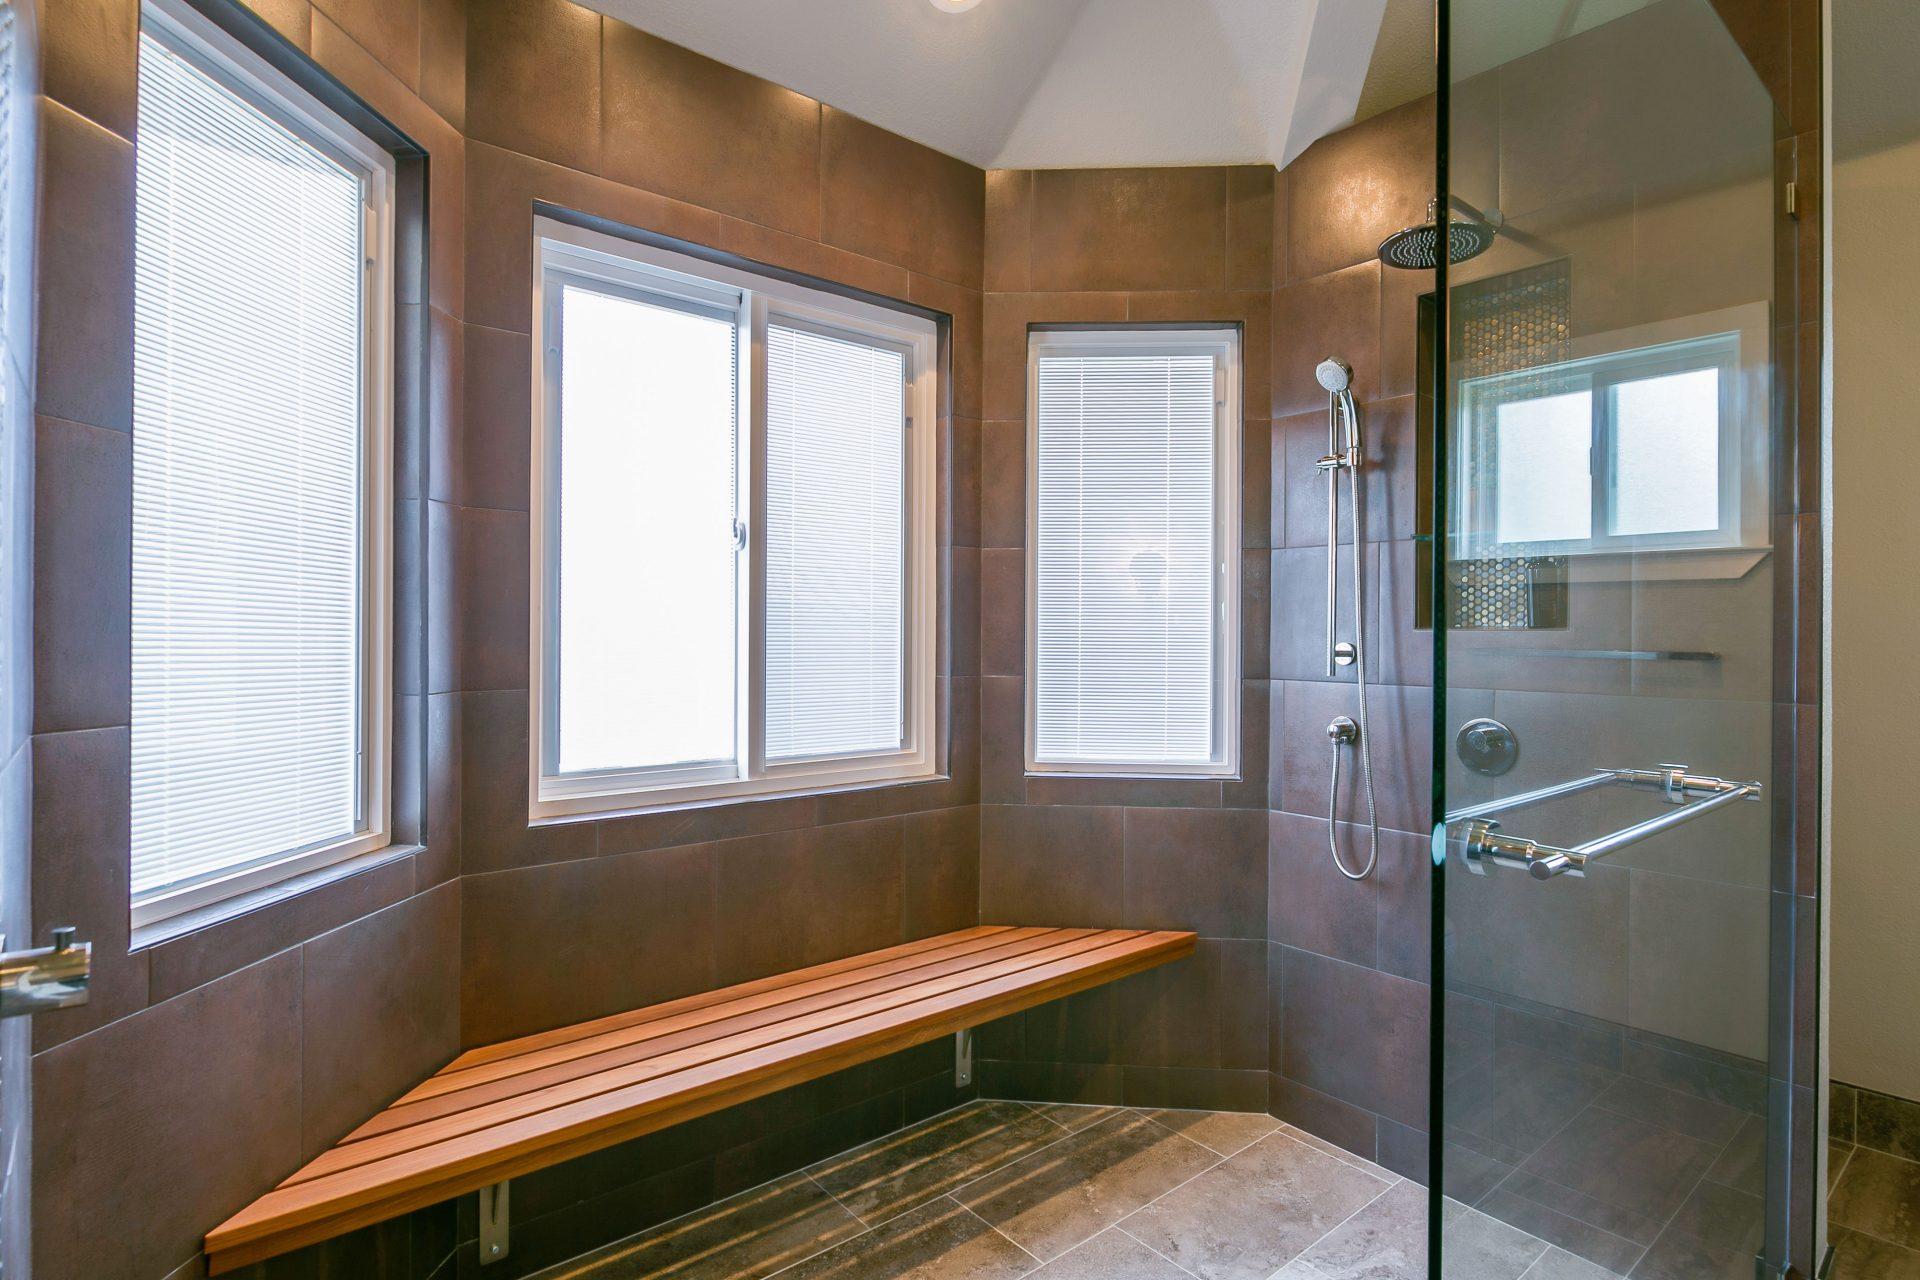 Updated shower bench